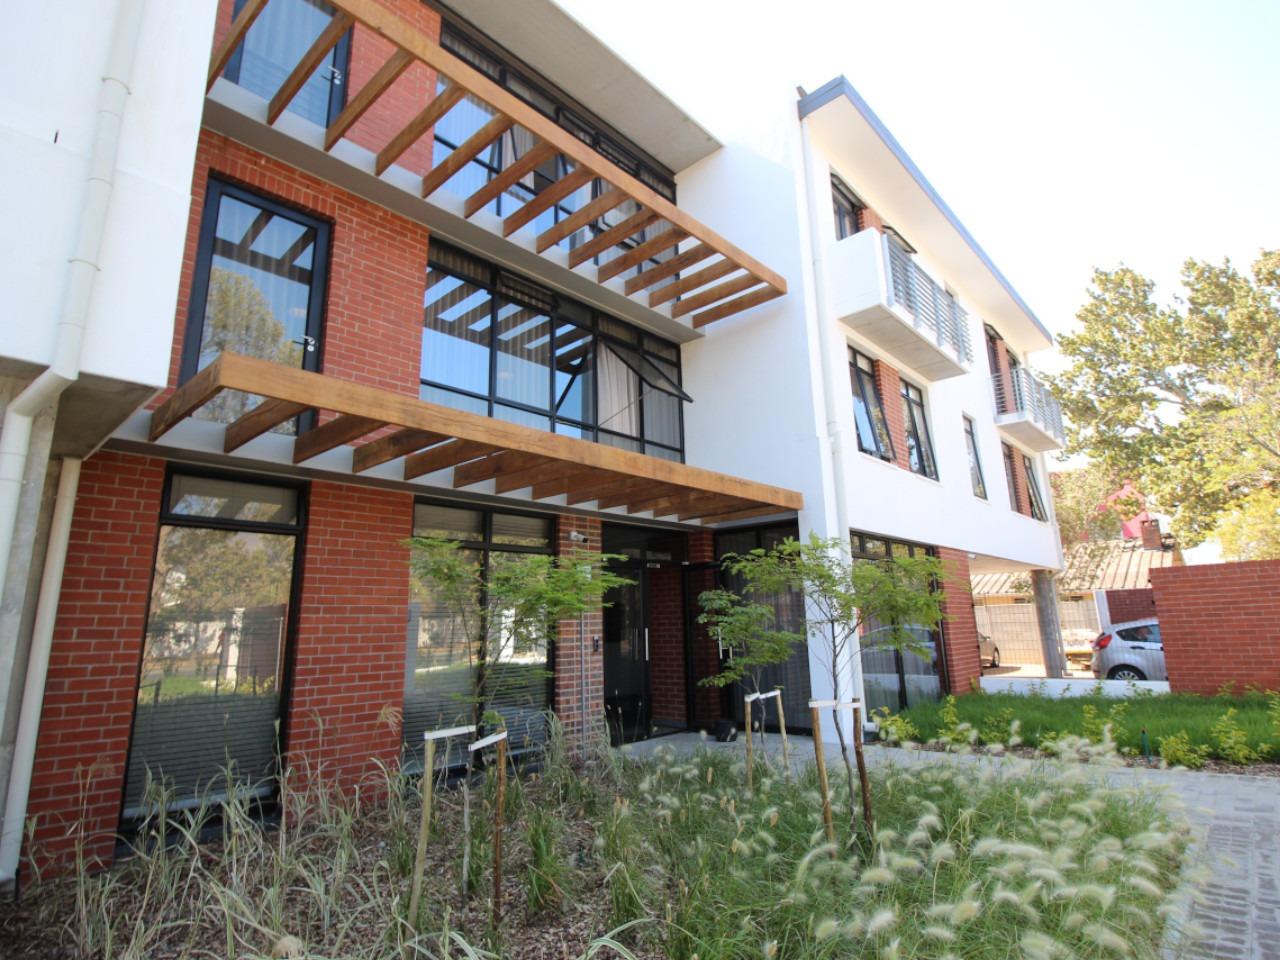 Armentum Student Apartments, CS Property Group